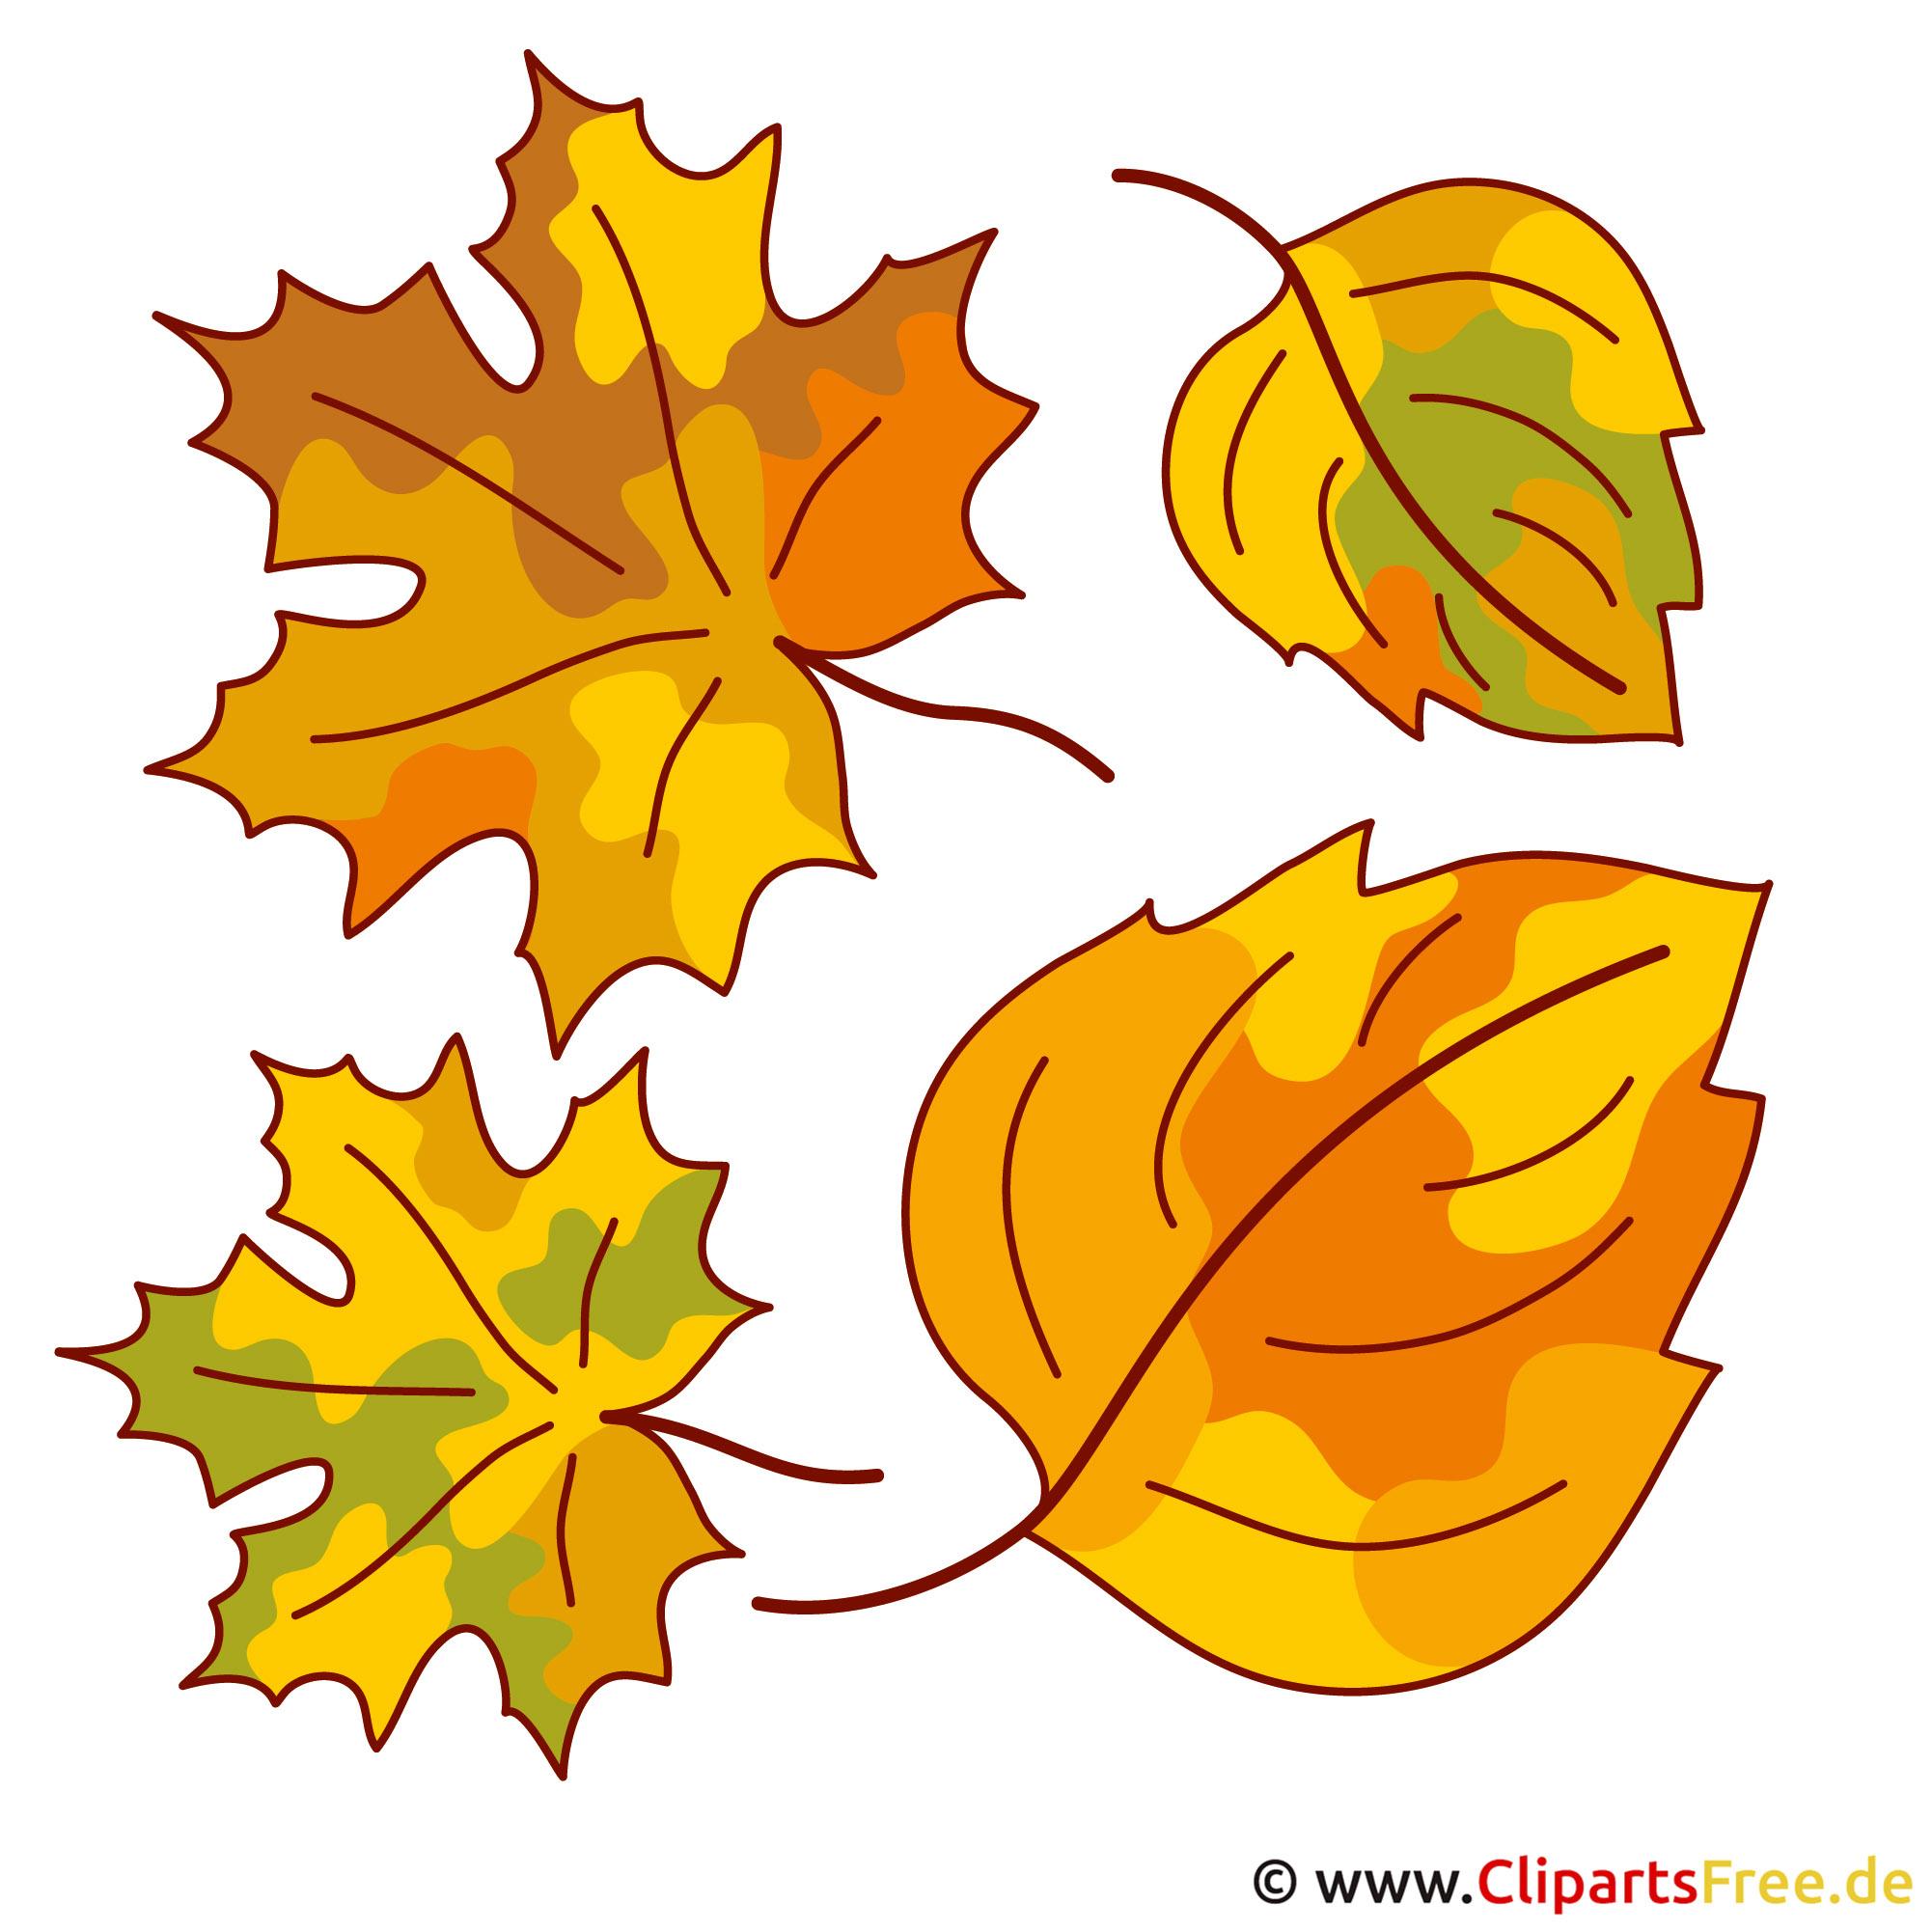 Blatt bl tter baumblatt herbst bilder gratis for Herbstbilder zum basteln